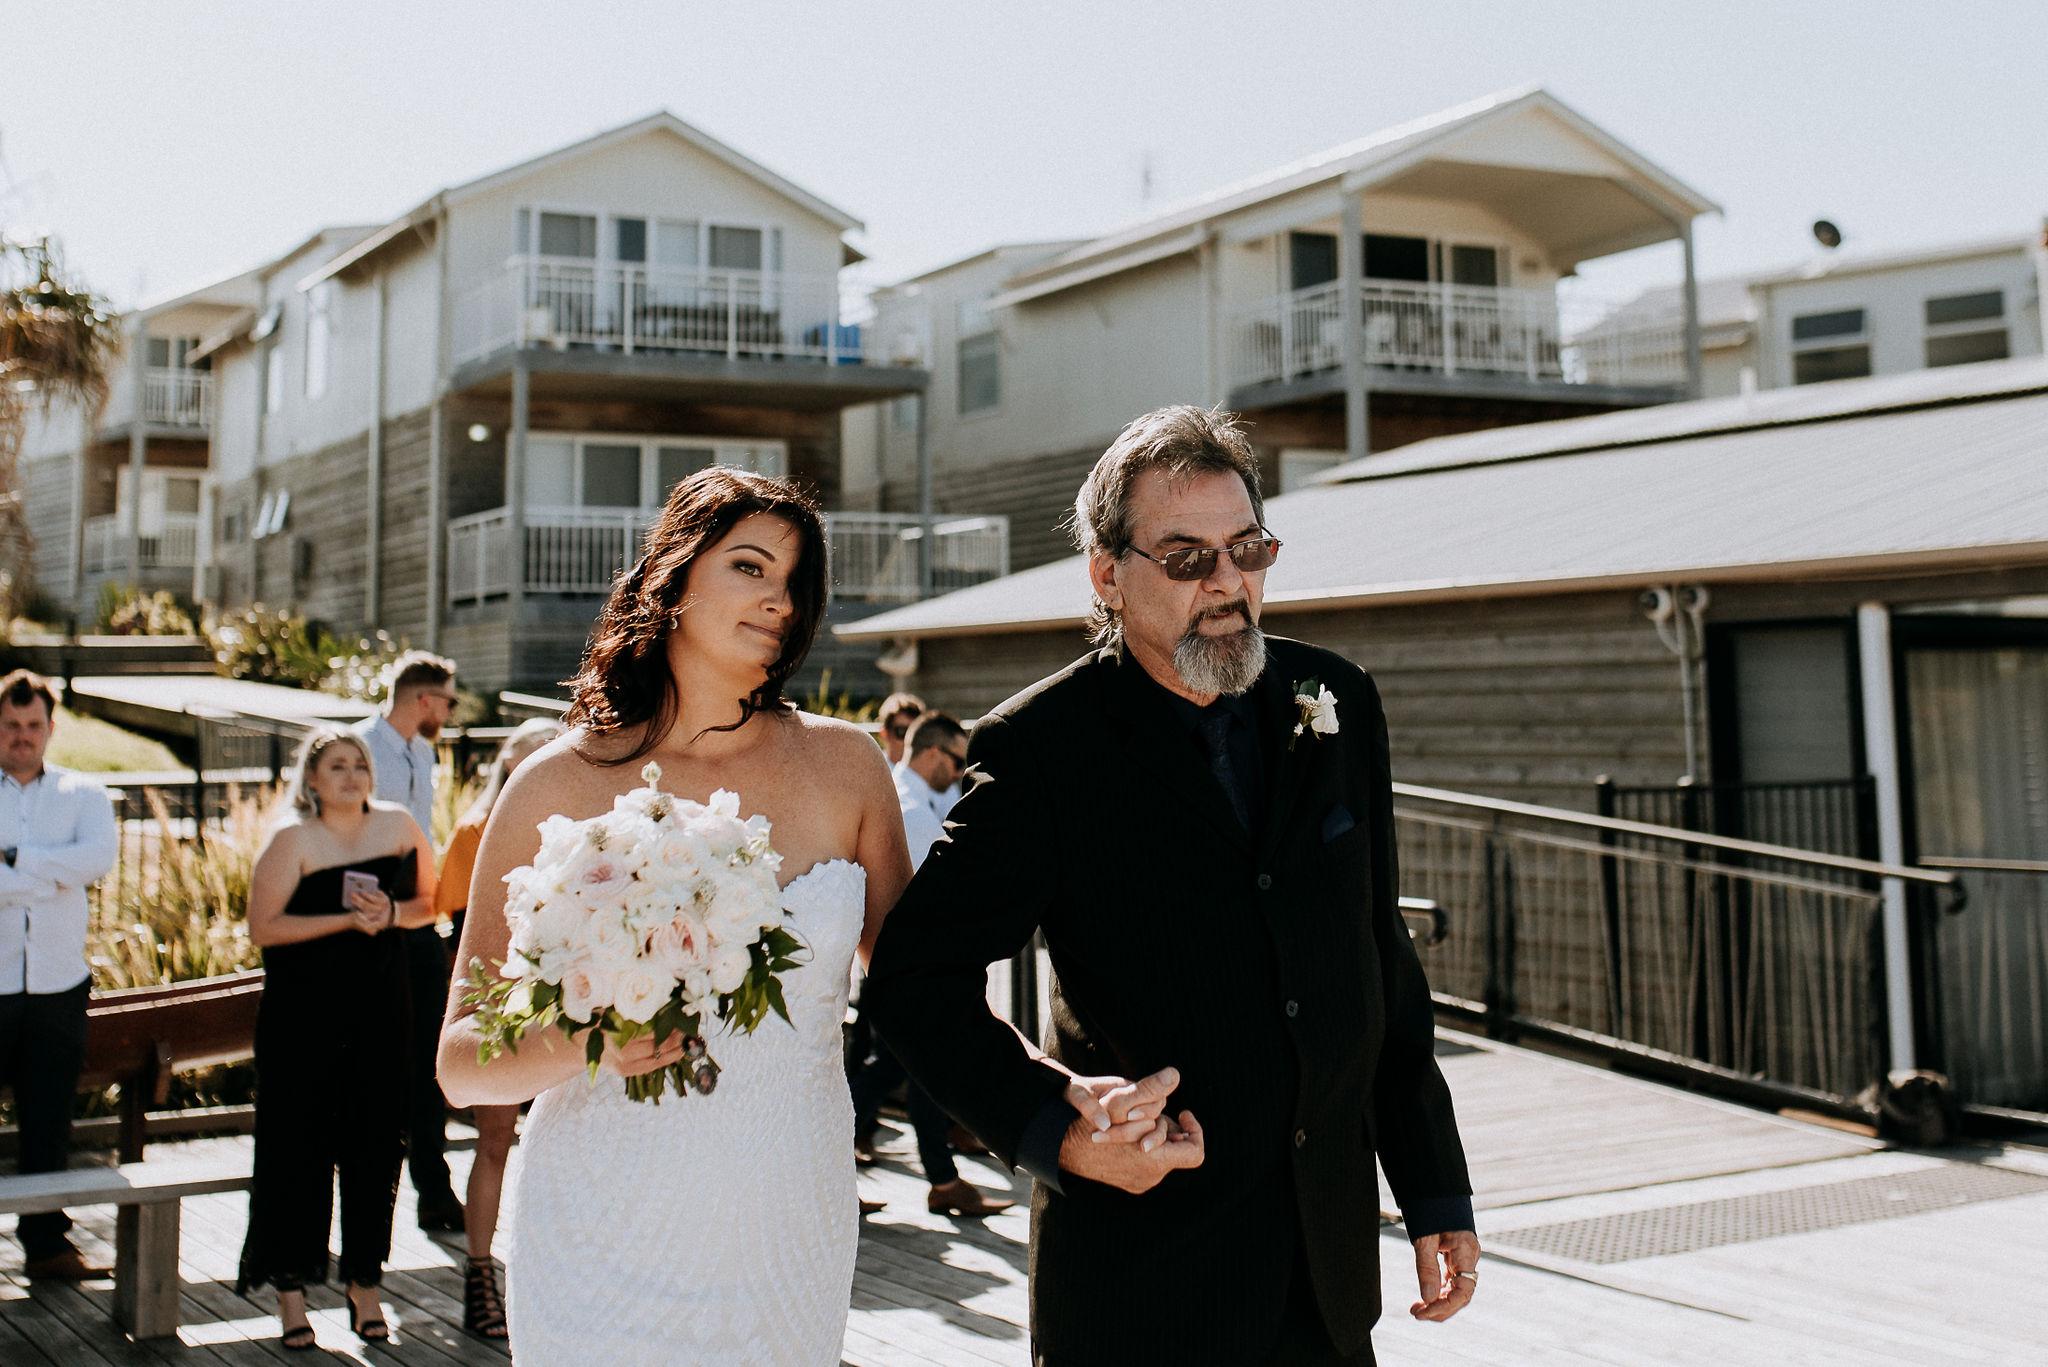 CAVES-BEACH-HOTEL-WEDDING-PATTEN-386.jpg